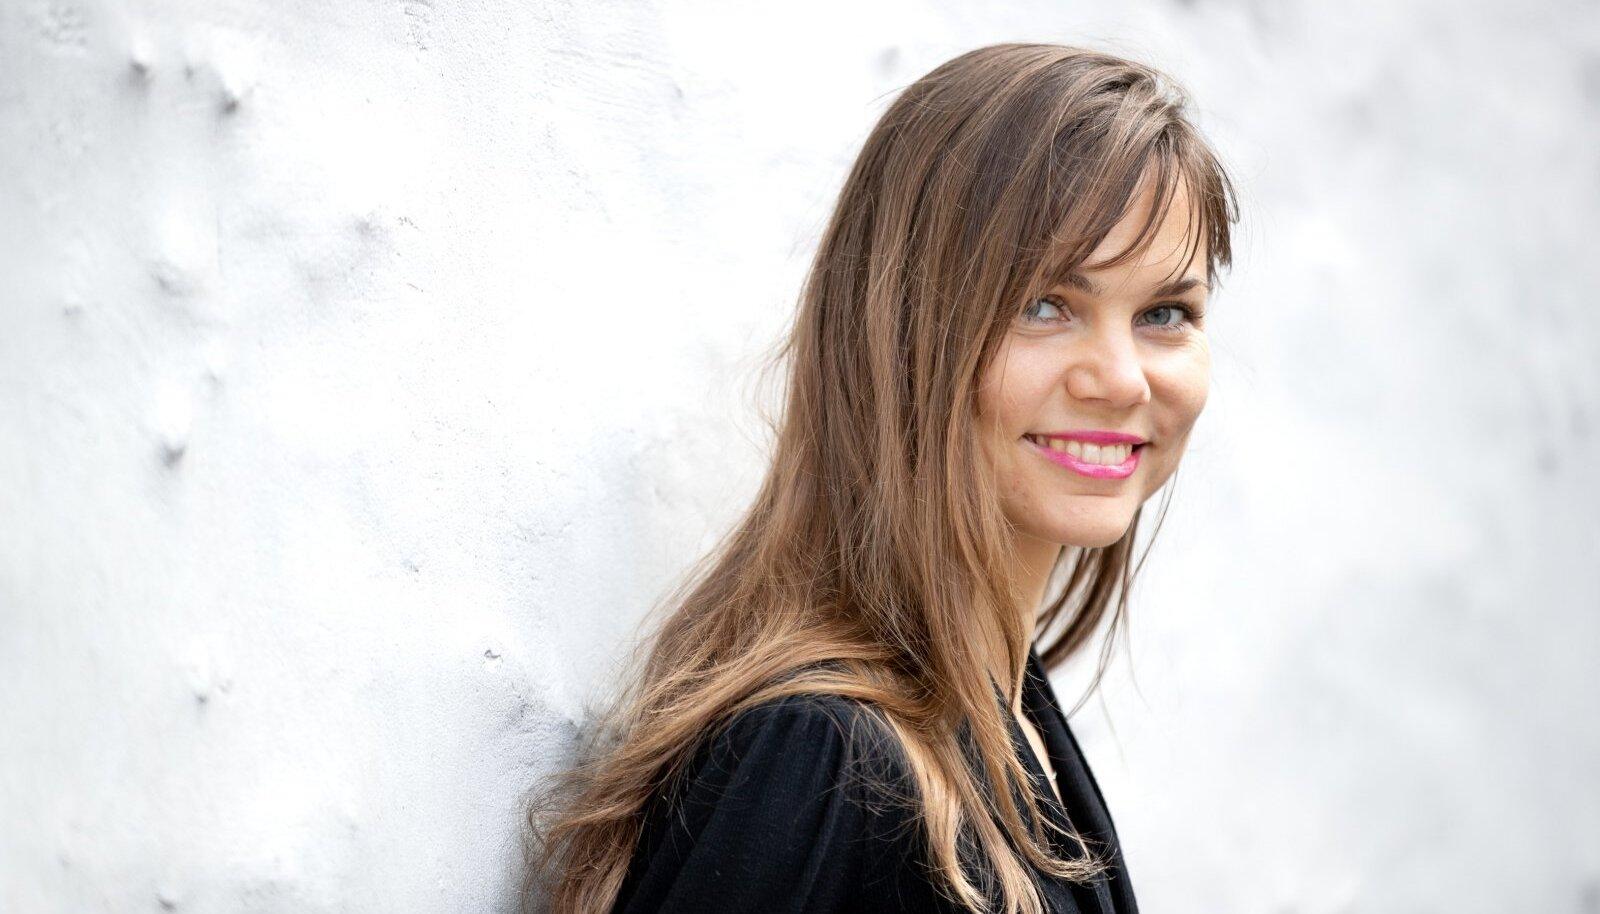 Karolin Tsarski